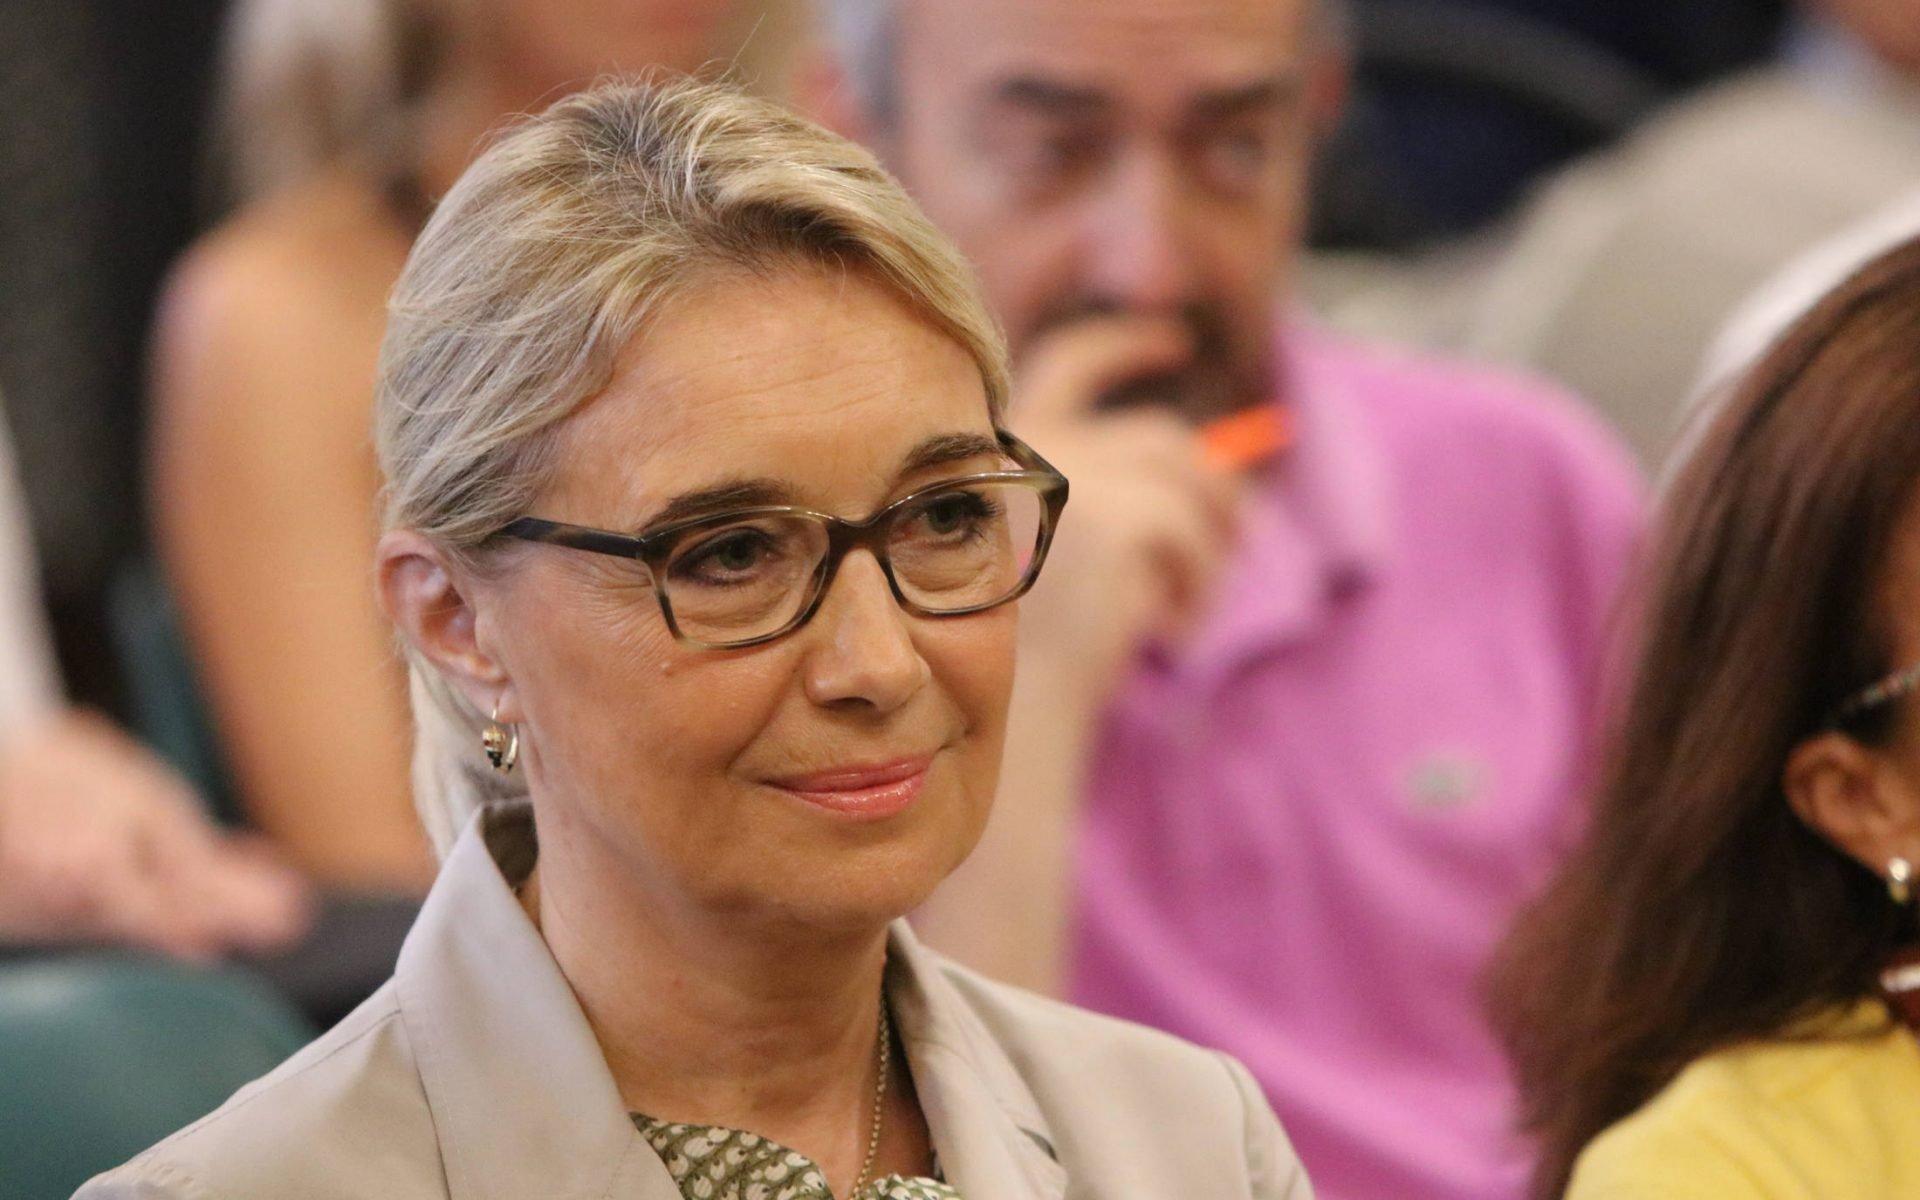 Assessore Francesca Briani: Cultura, Turismo. Manifestazioni, Pari opportunità